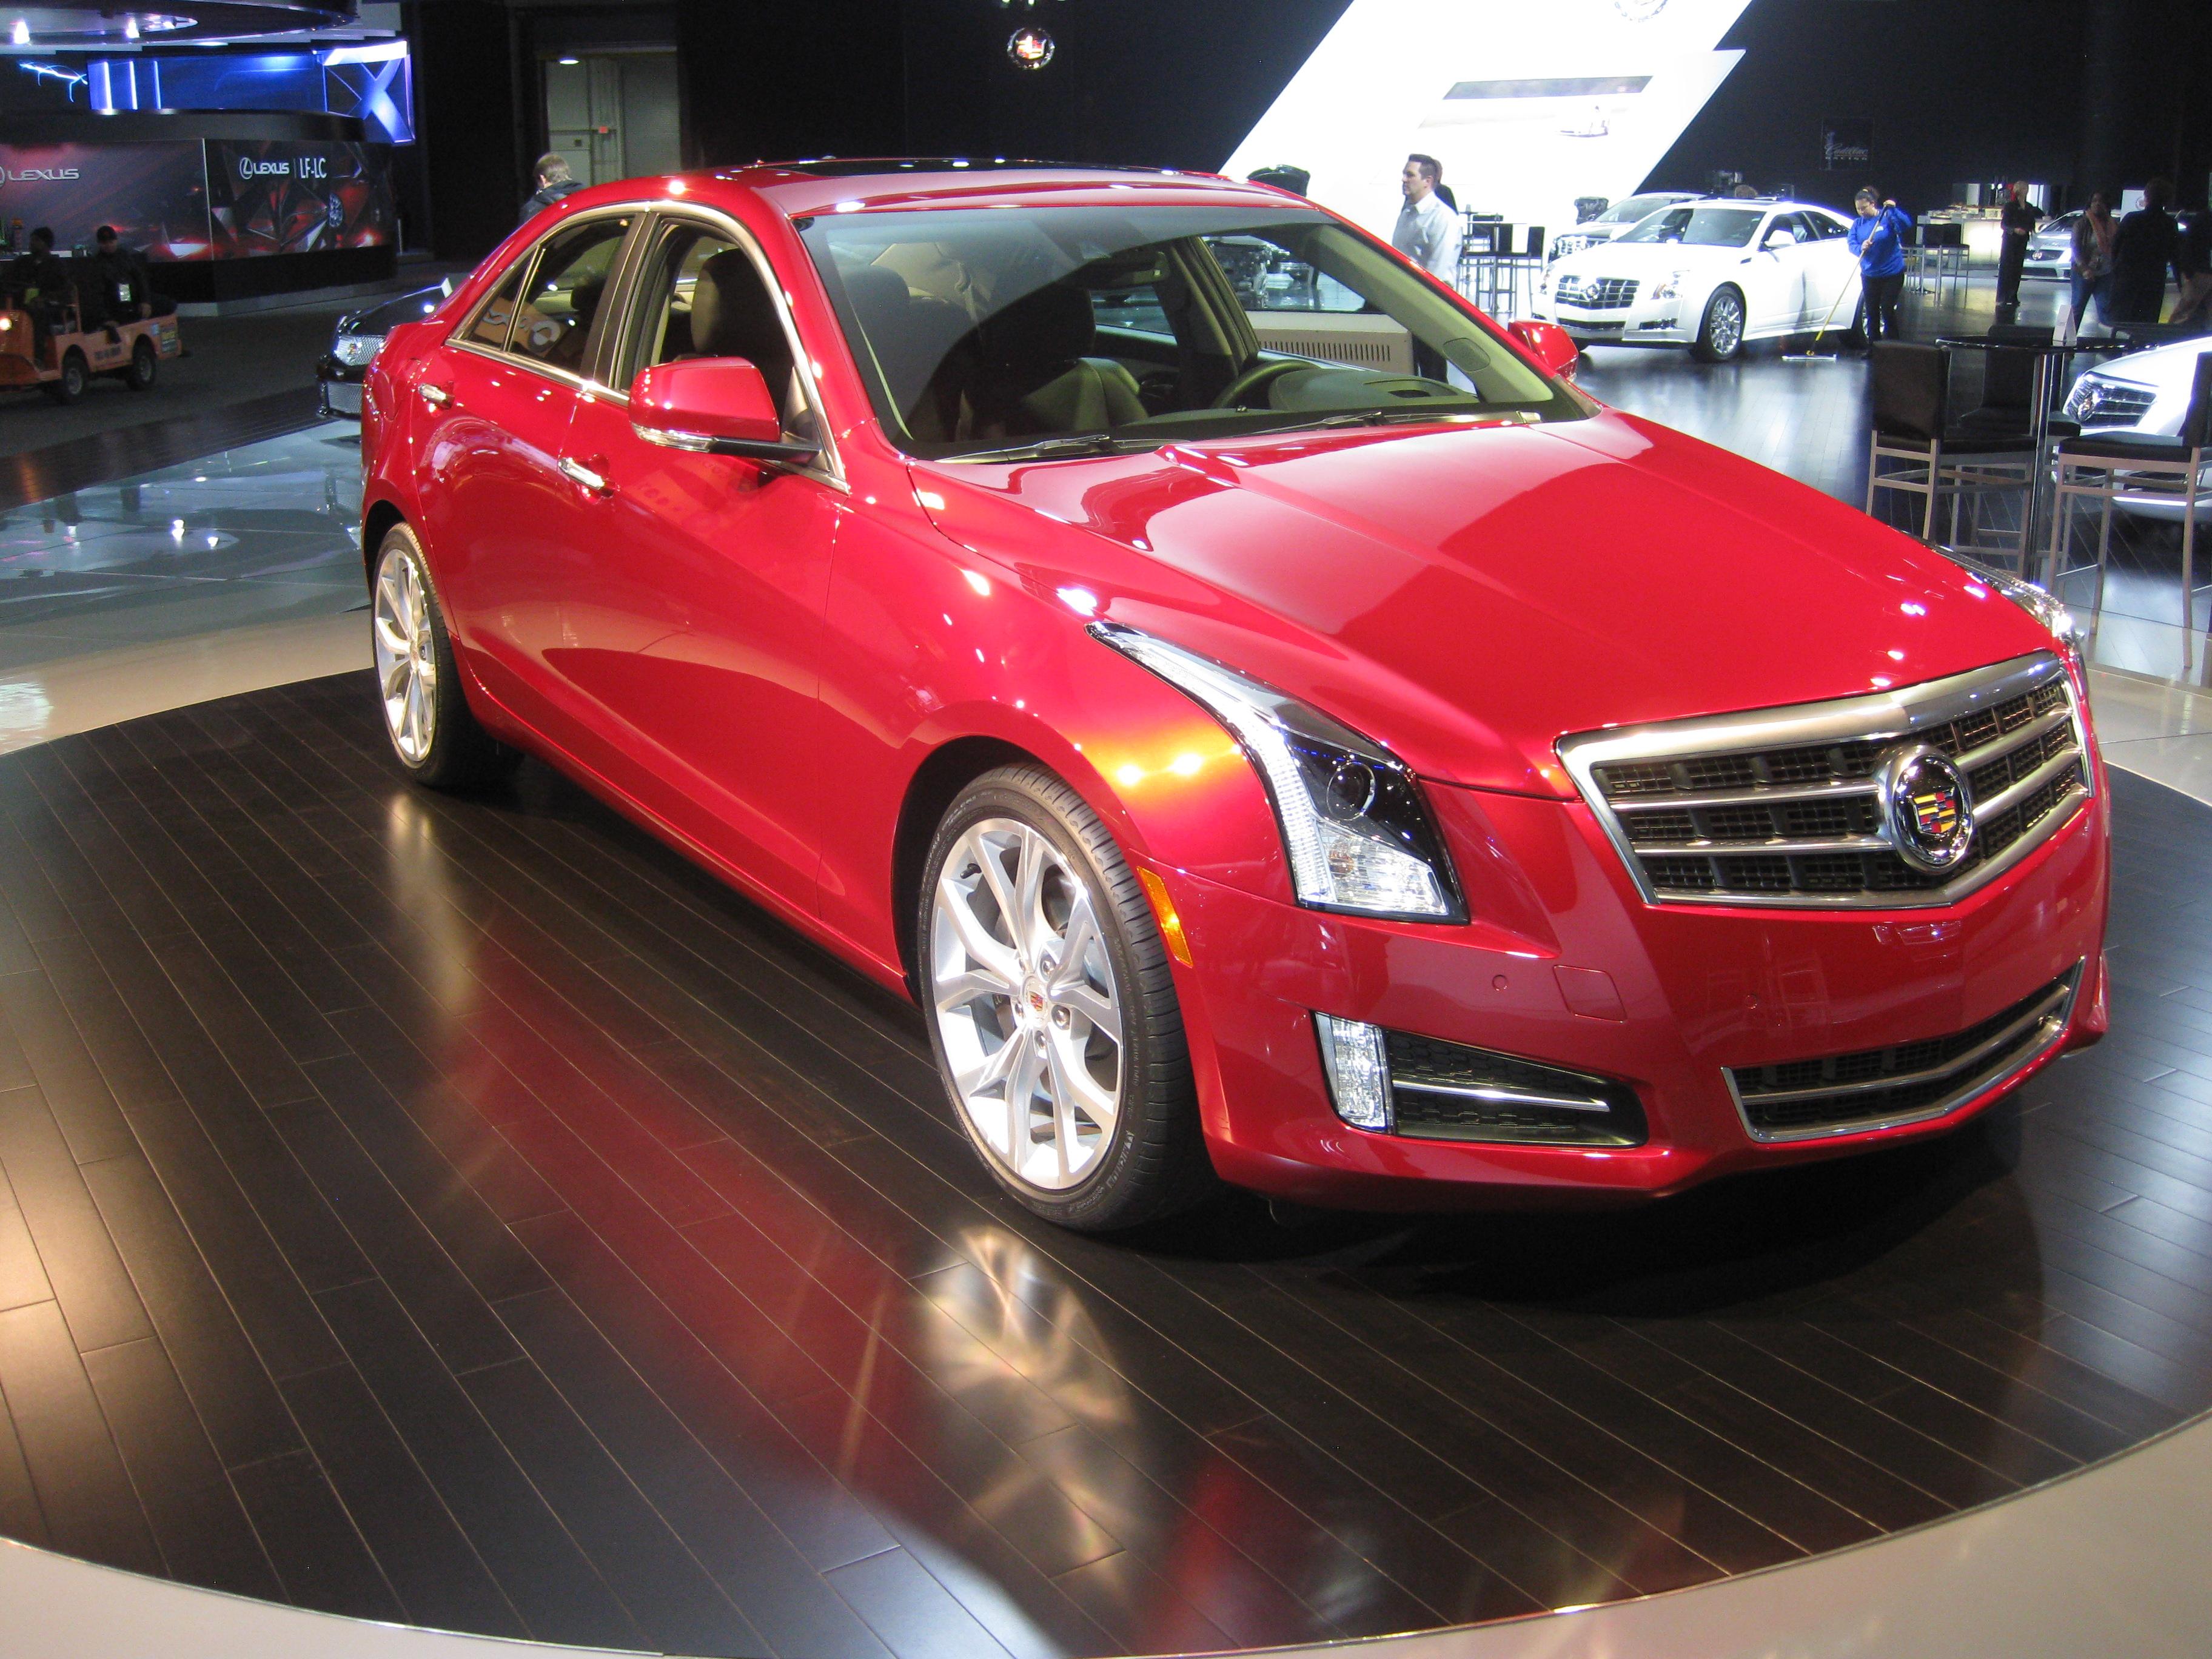 File:Cadillac ATS 2012.jpg - Wikimedia Commons